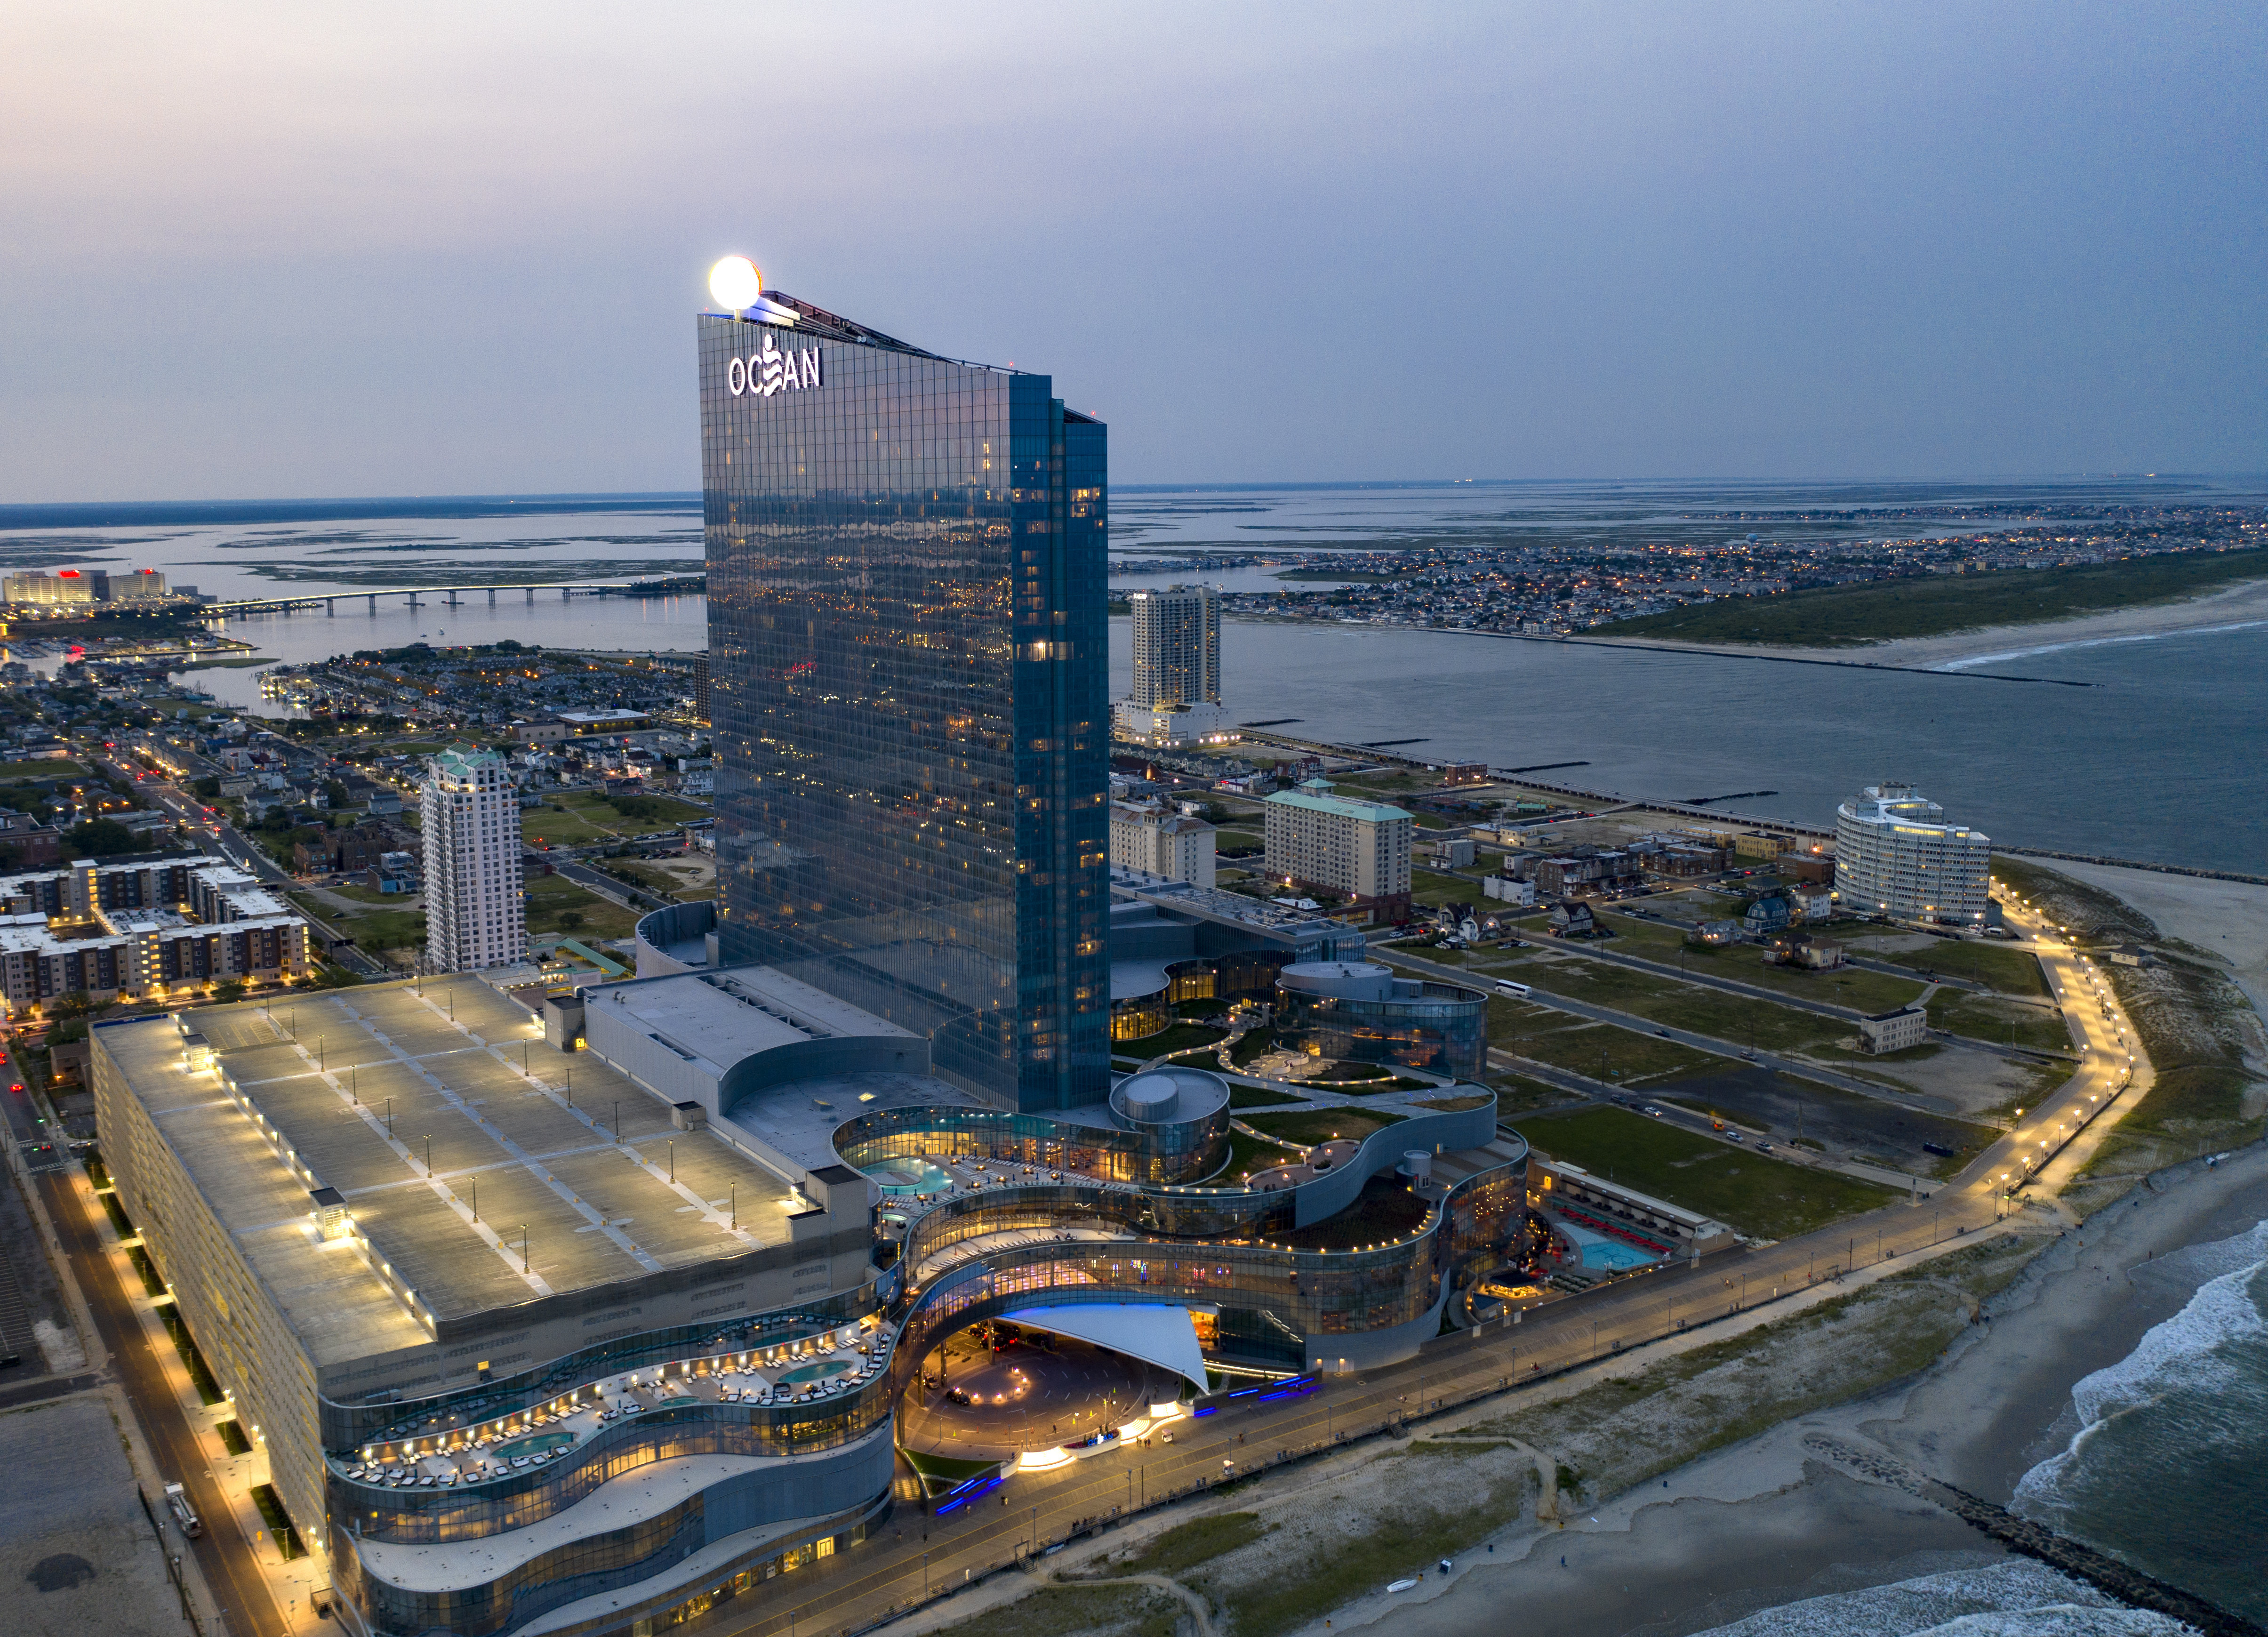 The Ocean Casino Resort